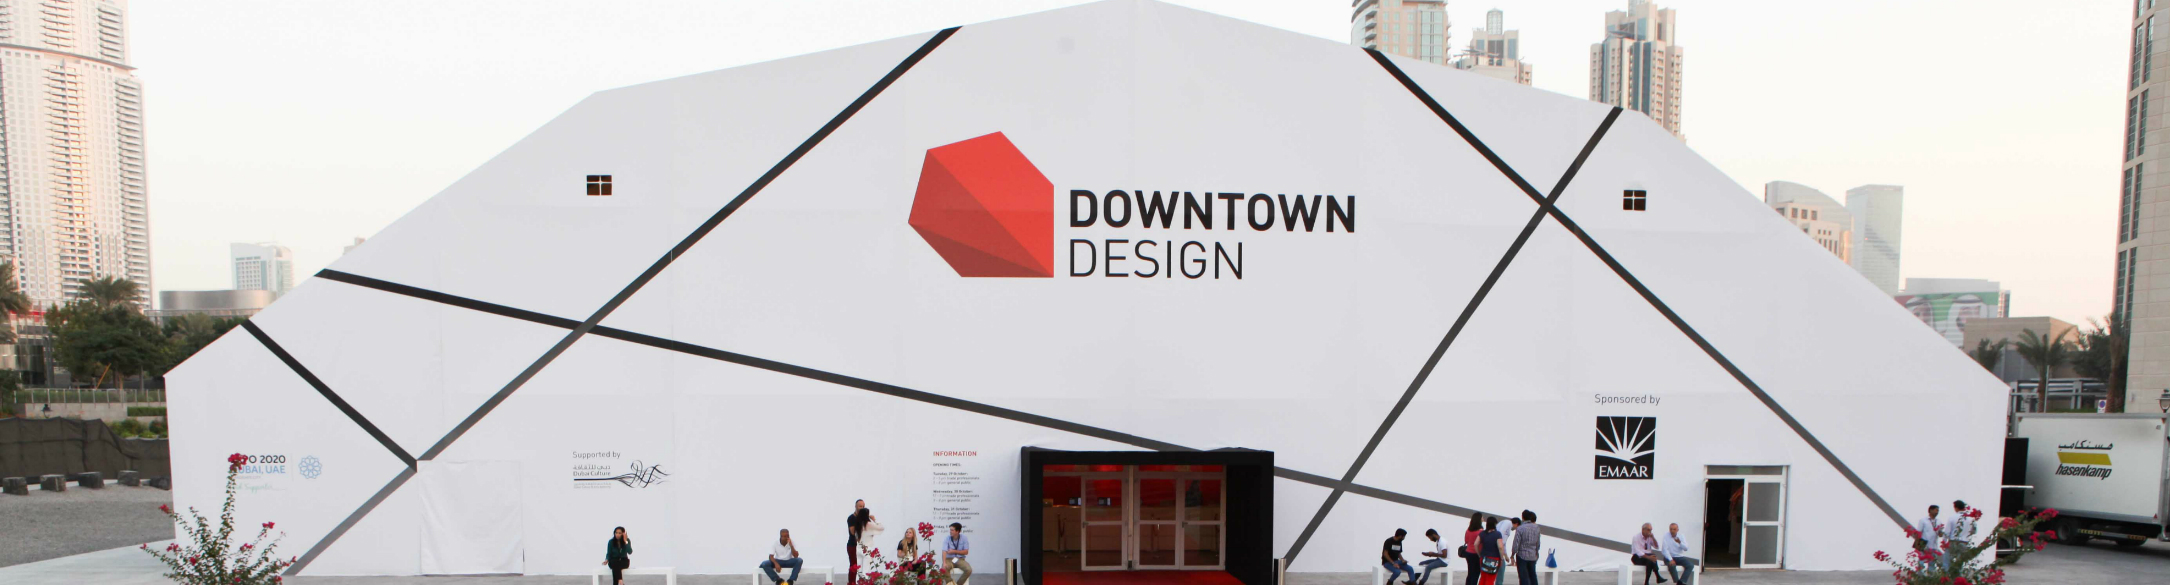 Design Exhibitions 2014 exhibitions & events   design & lifestyle blog